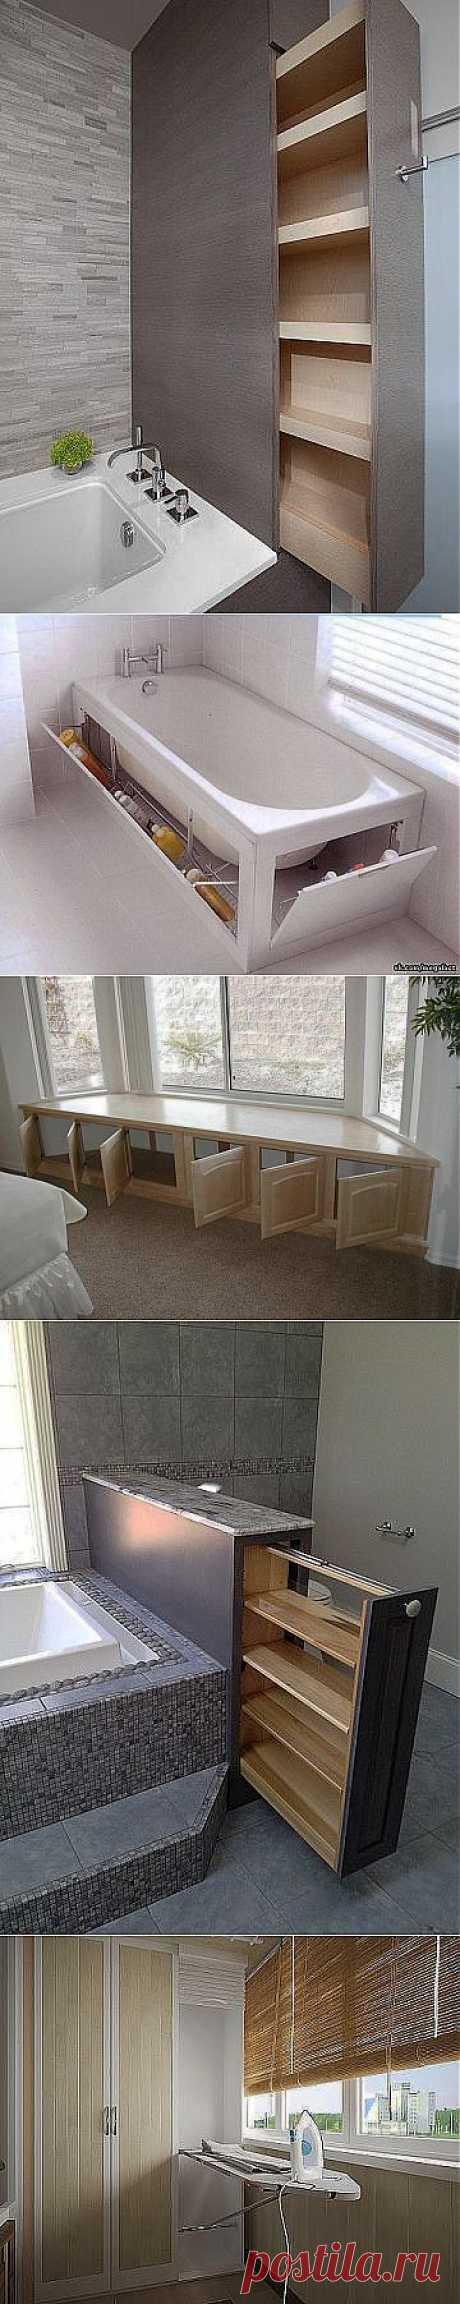 Useful area. (ideas for the house).